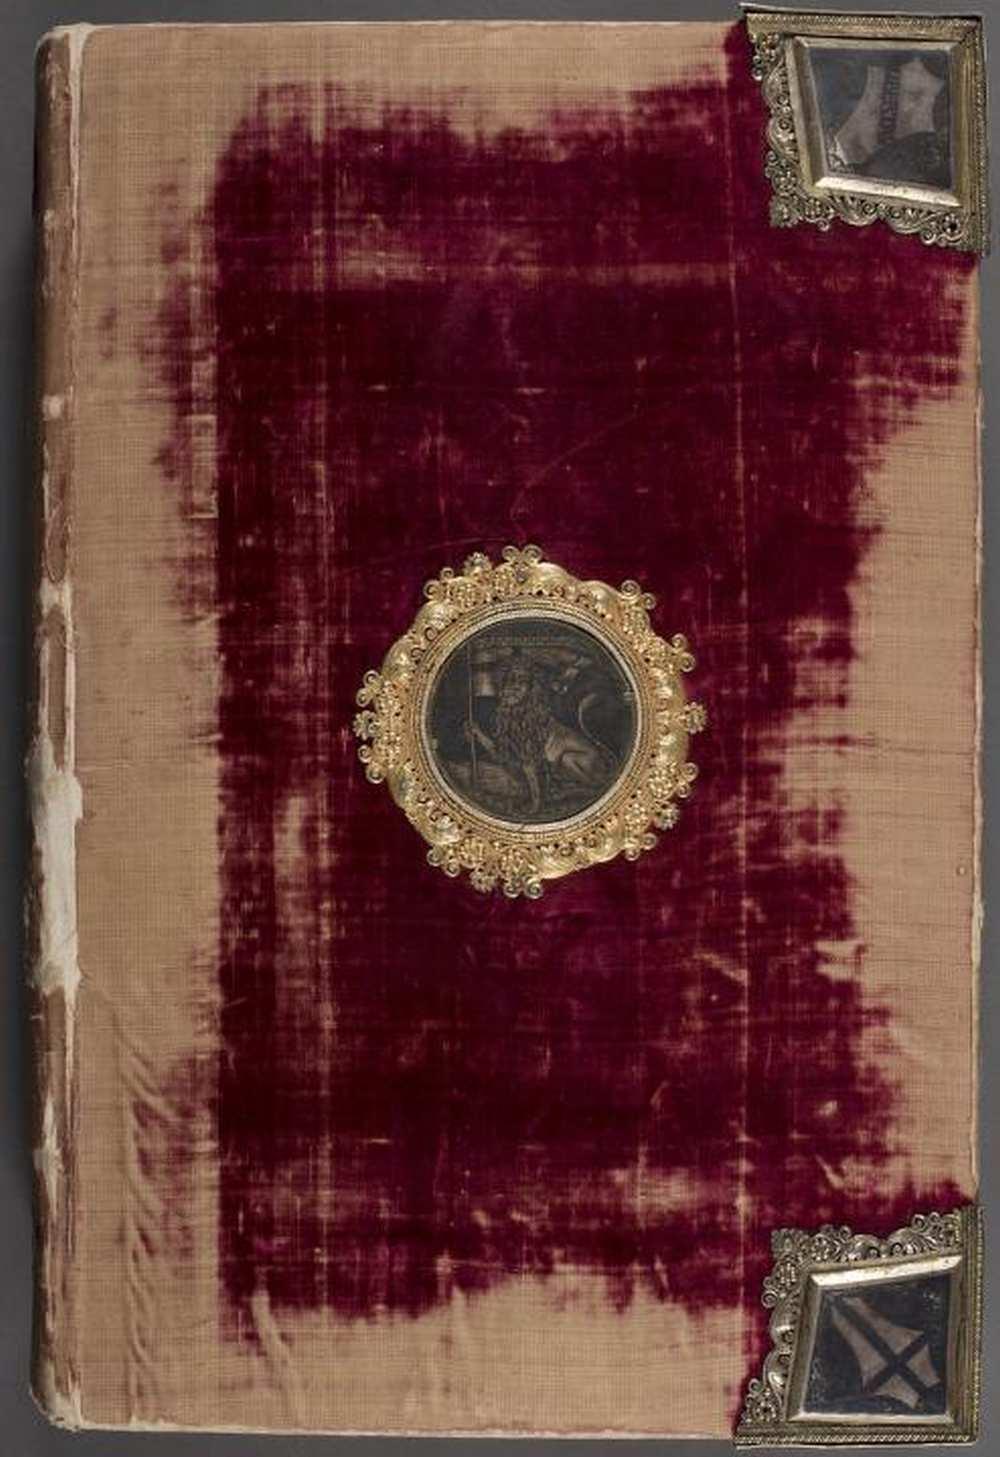 Firenze, Biblioteca Nazionale Centrale: Banco Rari 341. A kép forrása: Internet Archive https://archive.org/details/b.-r.-341-jpeg/page/n1/mode/2up